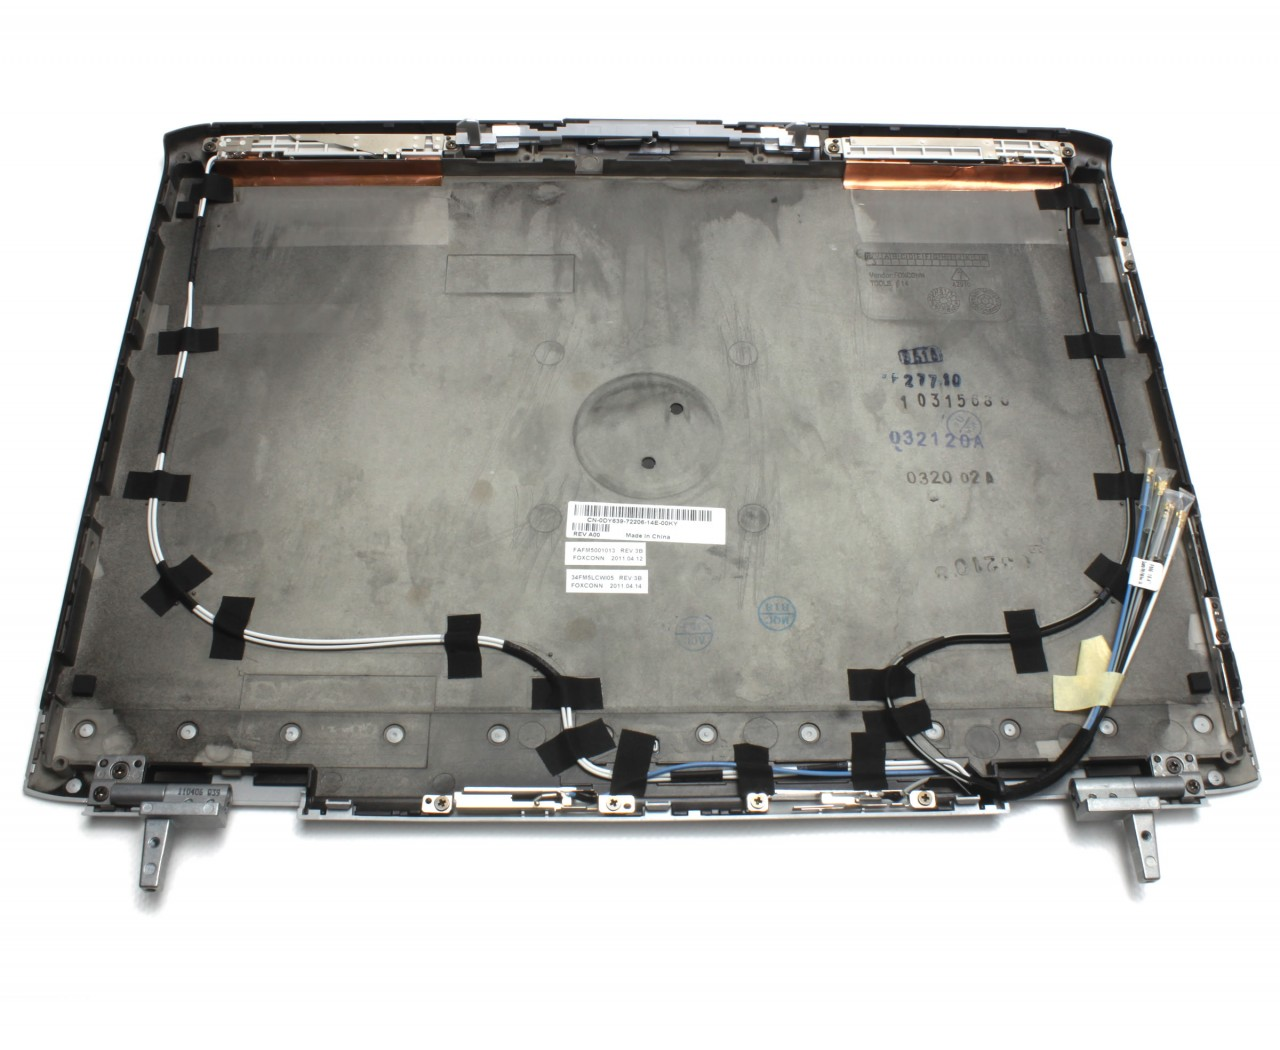 Capac Display BackCover Dell Vostro 1500 Carcasa Display imagine powerlaptop.ro 2021